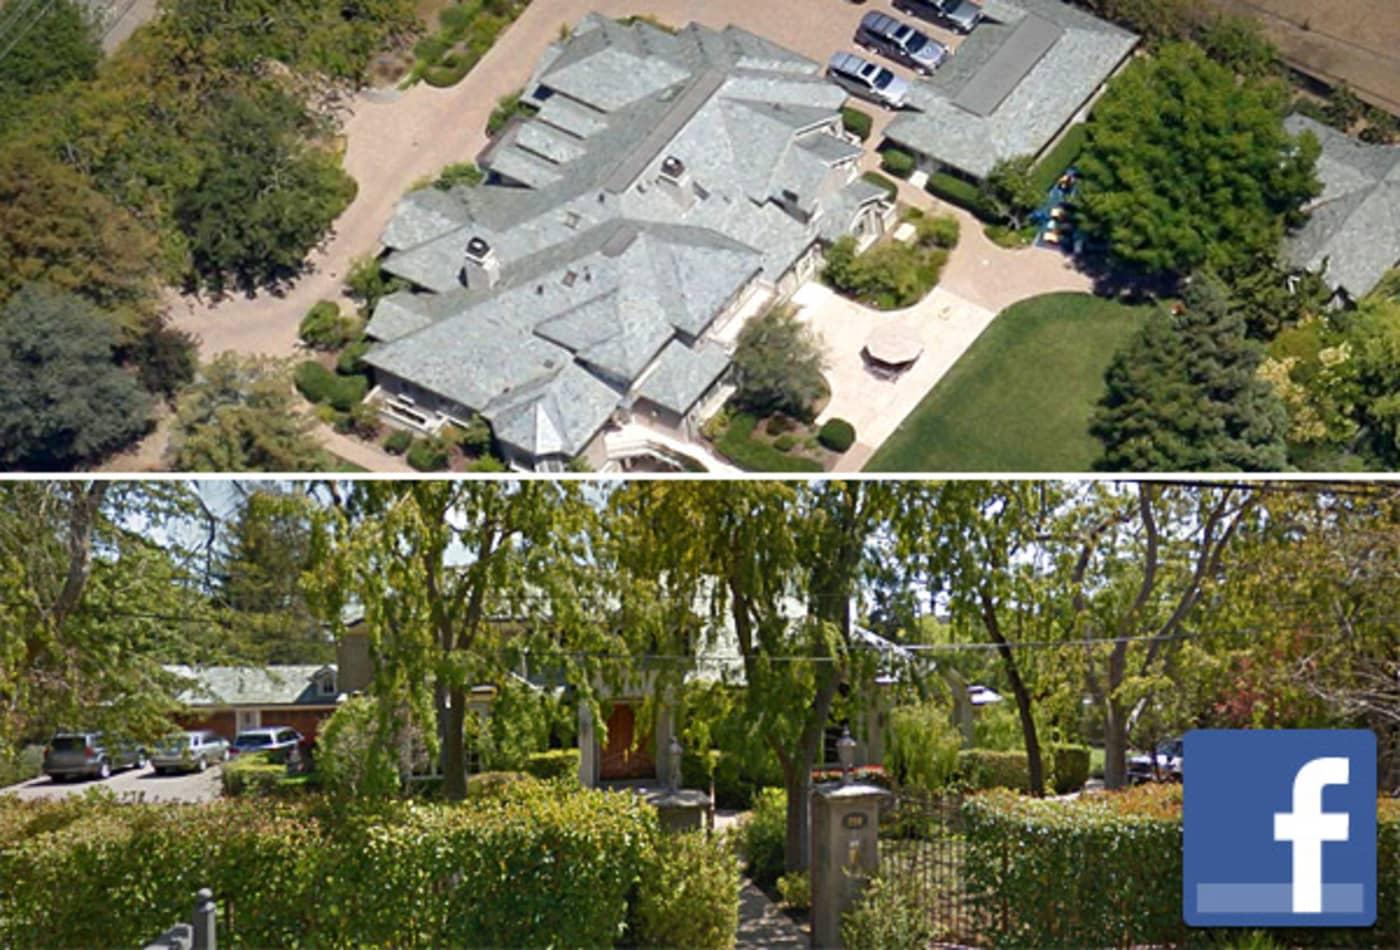 Sheryl-Sandberg-Facebook-Tech-Titan-Homes.jpg